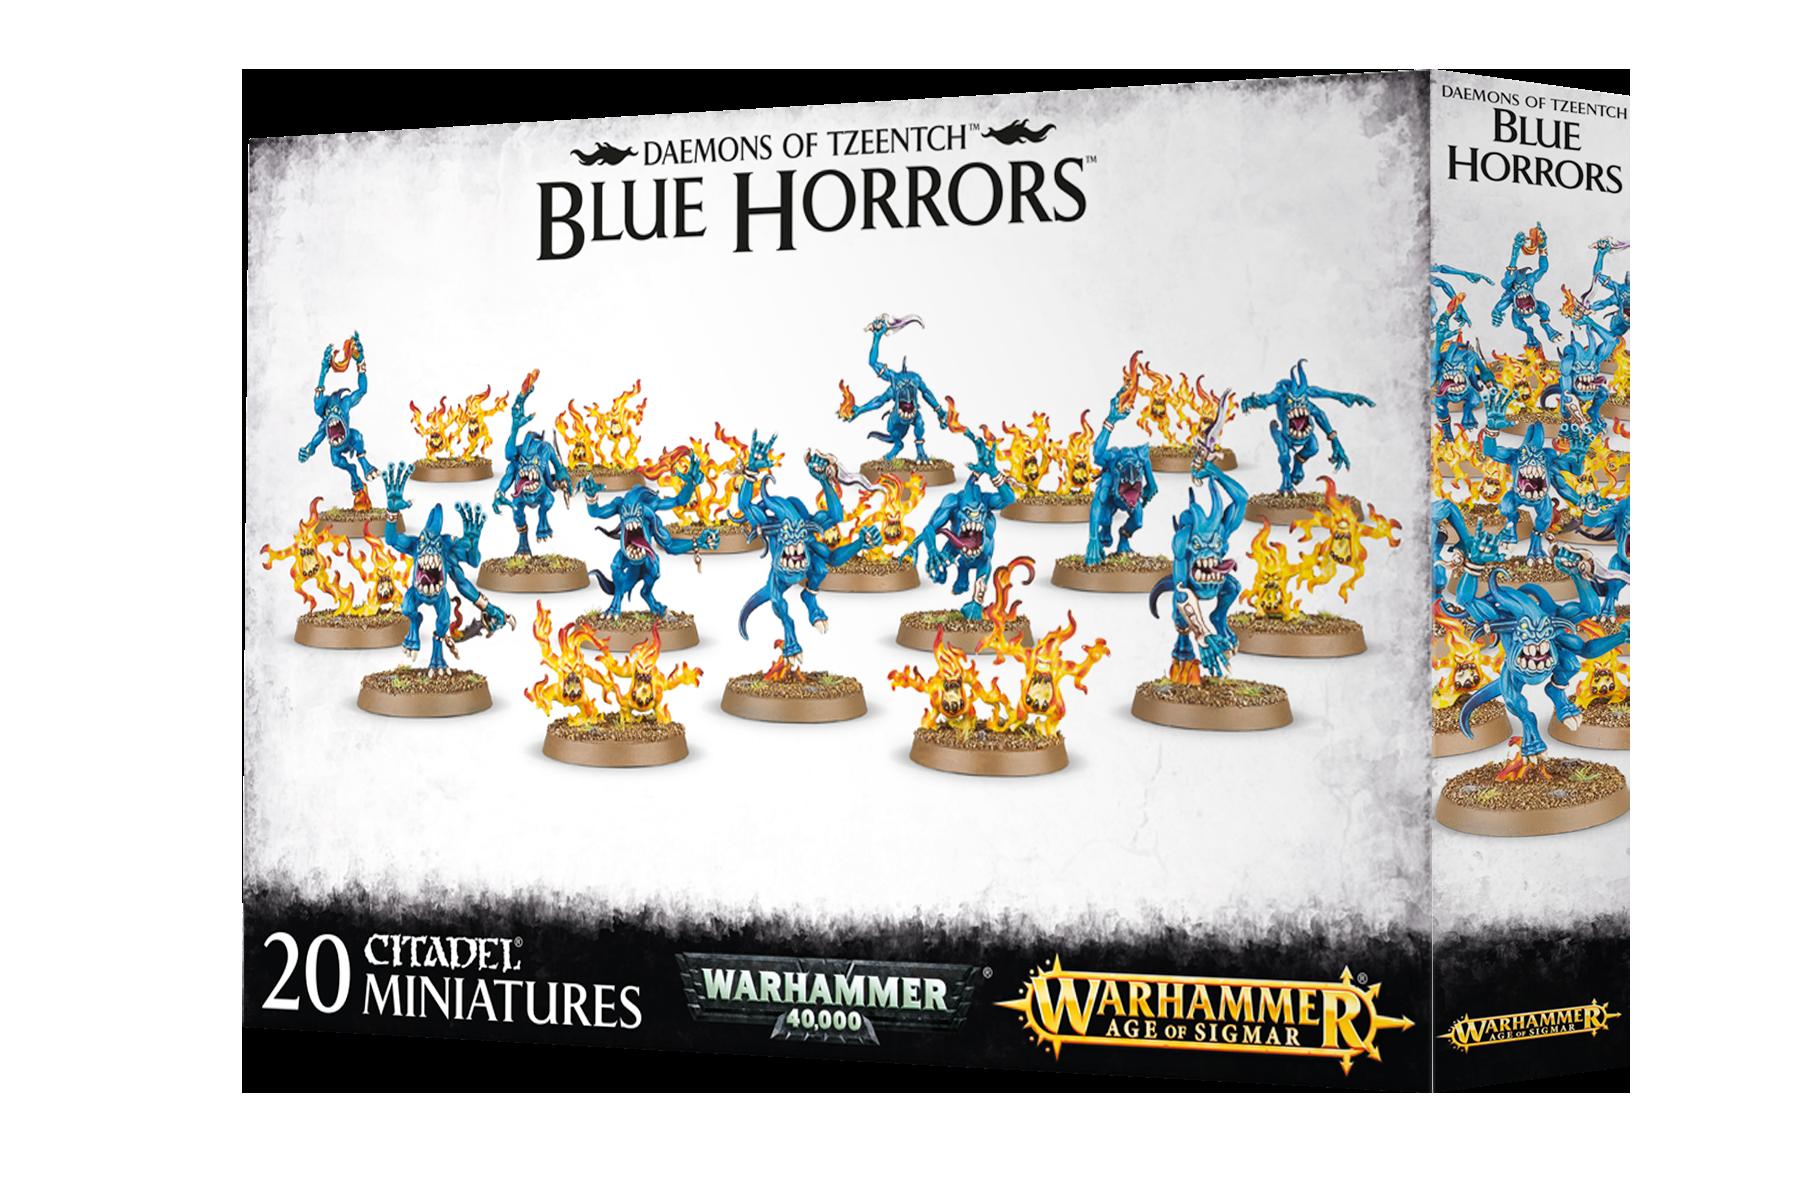 Blue Horrors Daemons of Tzeentch Age of Sigmar